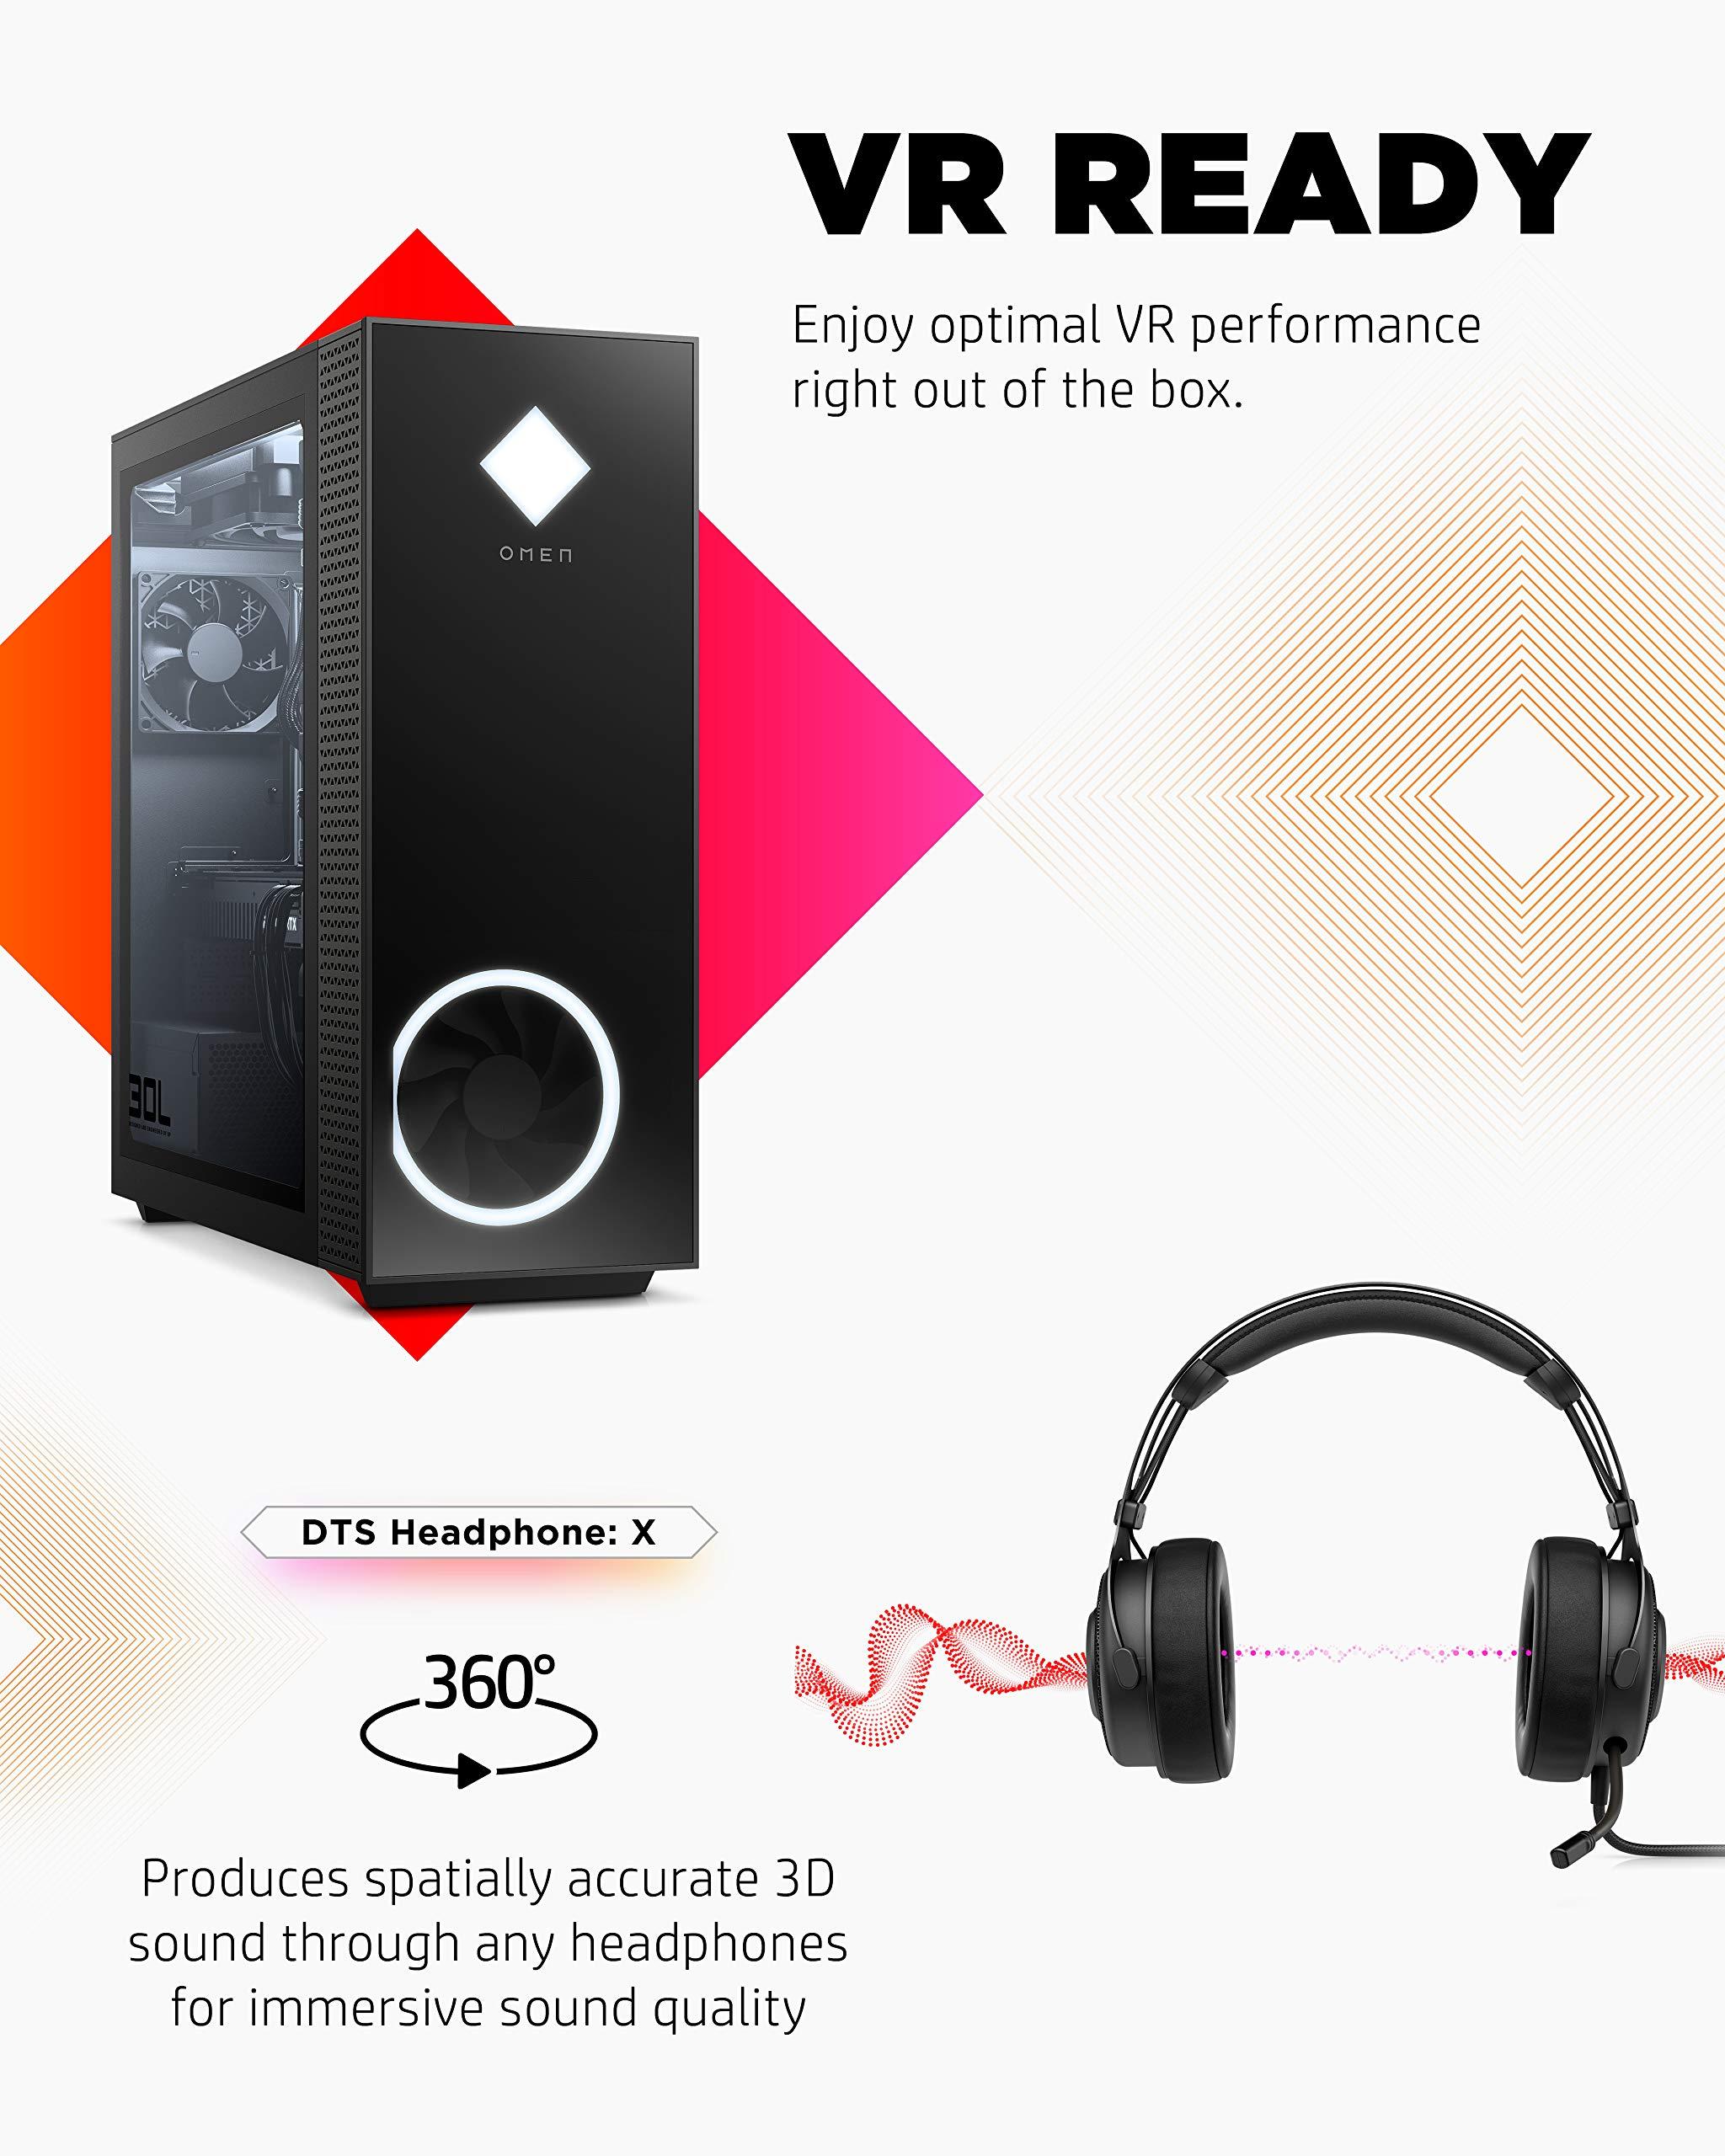 OMEN - GT13-0090 30L Gaming Desktop PC, NVIDIA GeForce RTX 3090 Graphics Card, 10th Generation Intel Core i9-10850K Processor, 32 GB RAM, 1 TB SSD, Windows 10 Home (GT13-0090, 2020) Shadow black